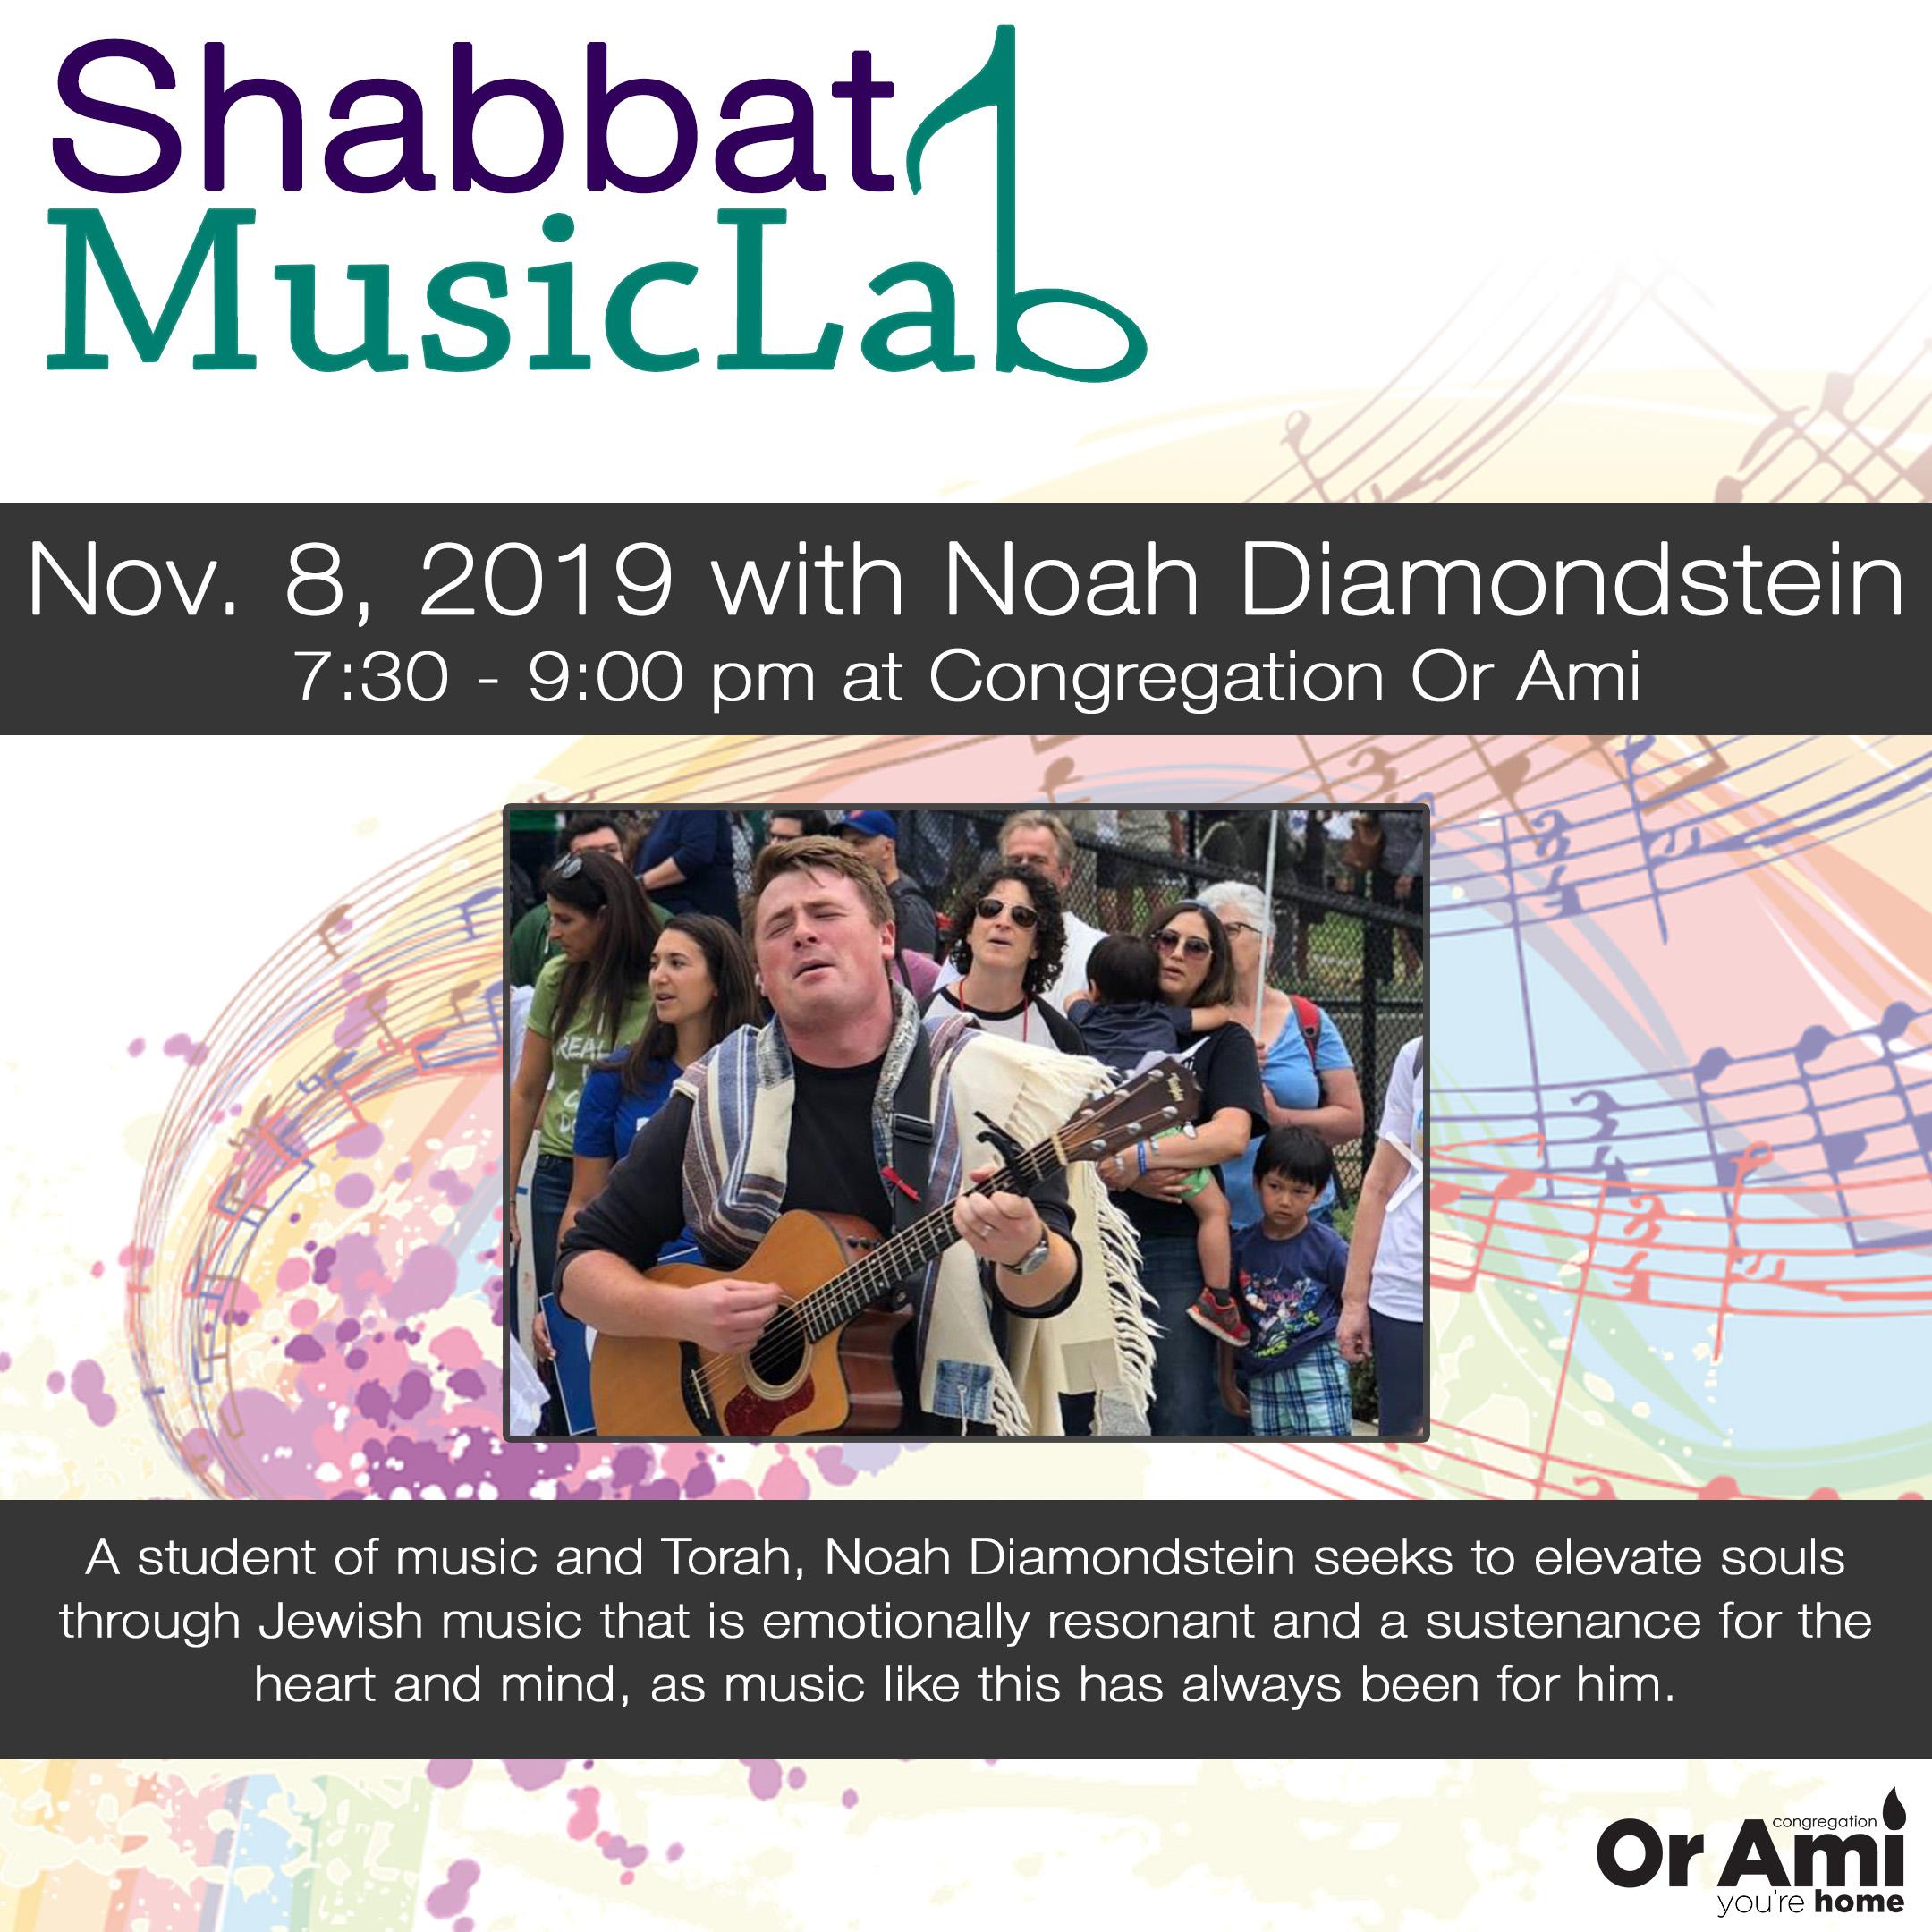 Shabbat MusicLab Noah Diamondstein